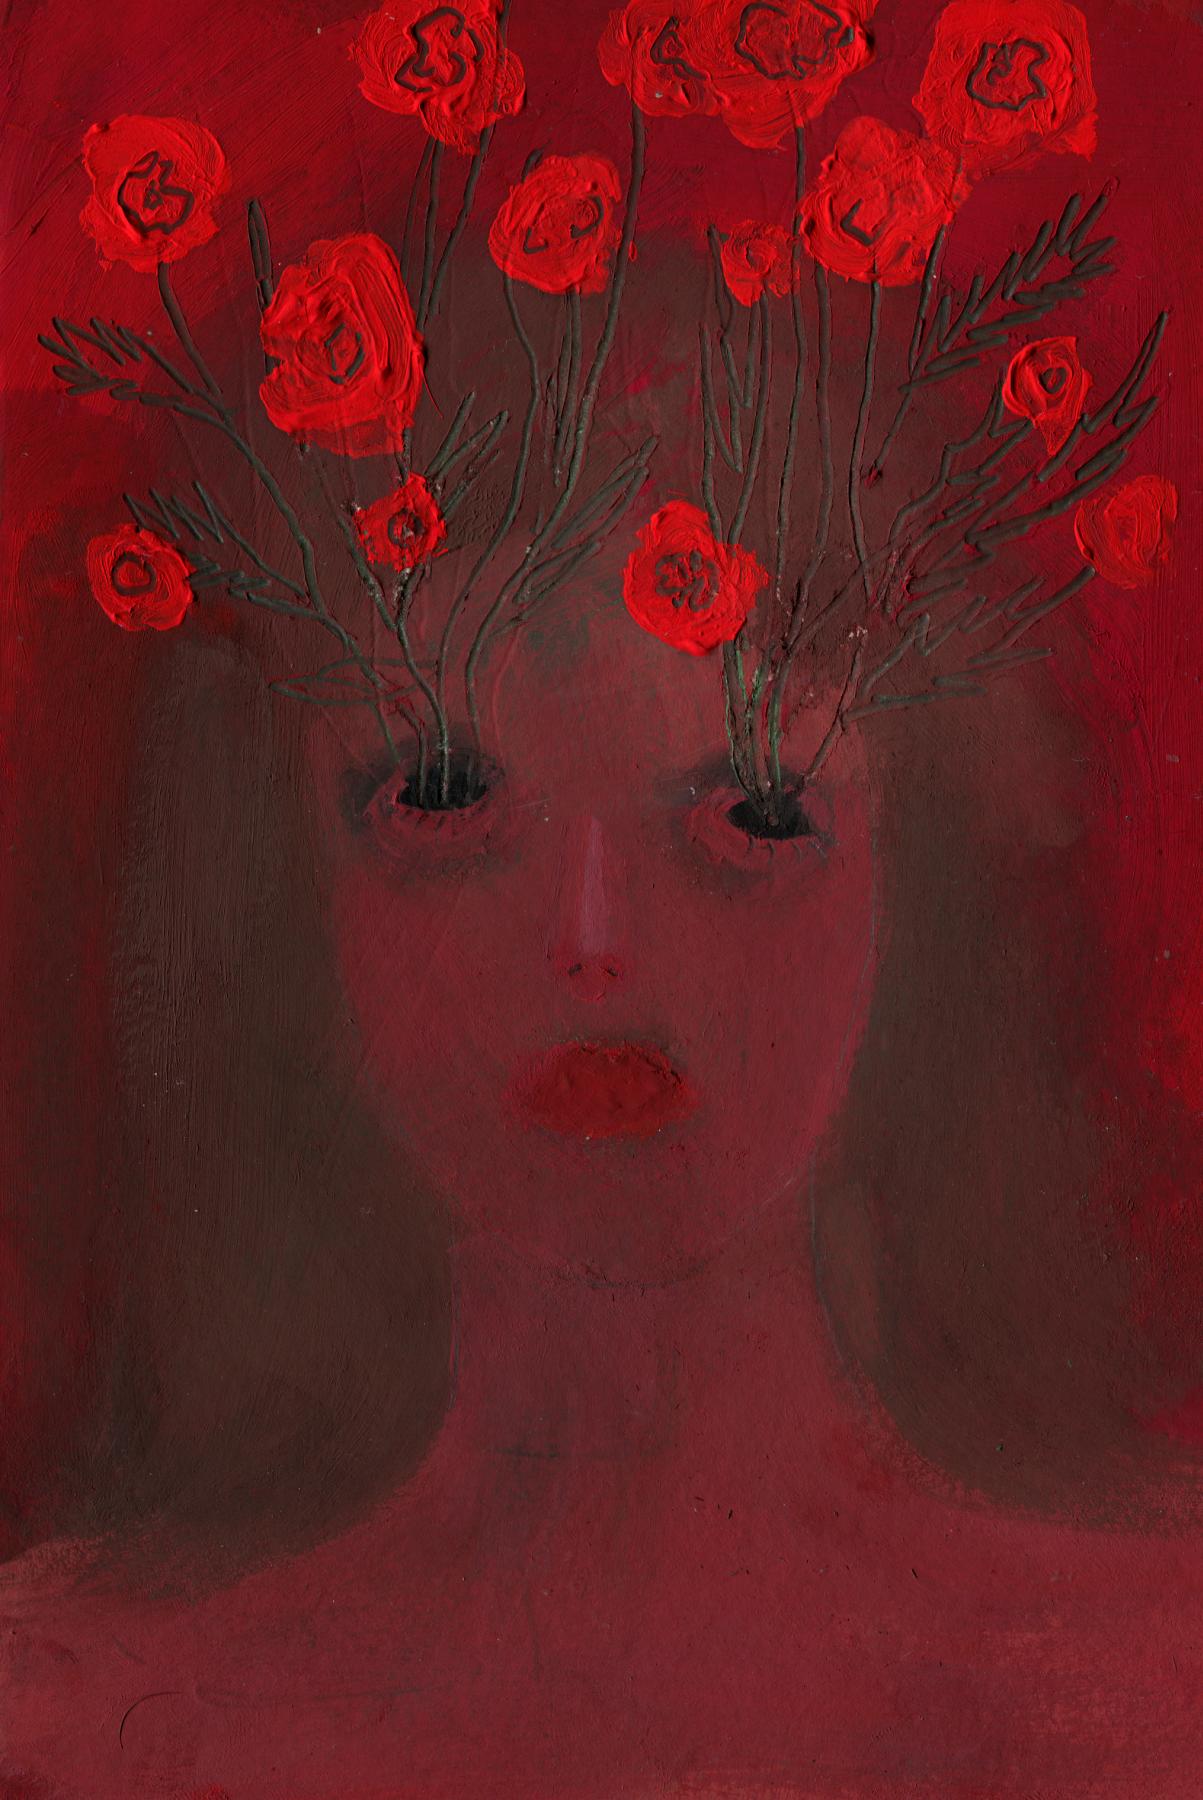 Anastasia Sergeevna Rydlevskaya. I cried out my eyes, now bloody poppies grow from them